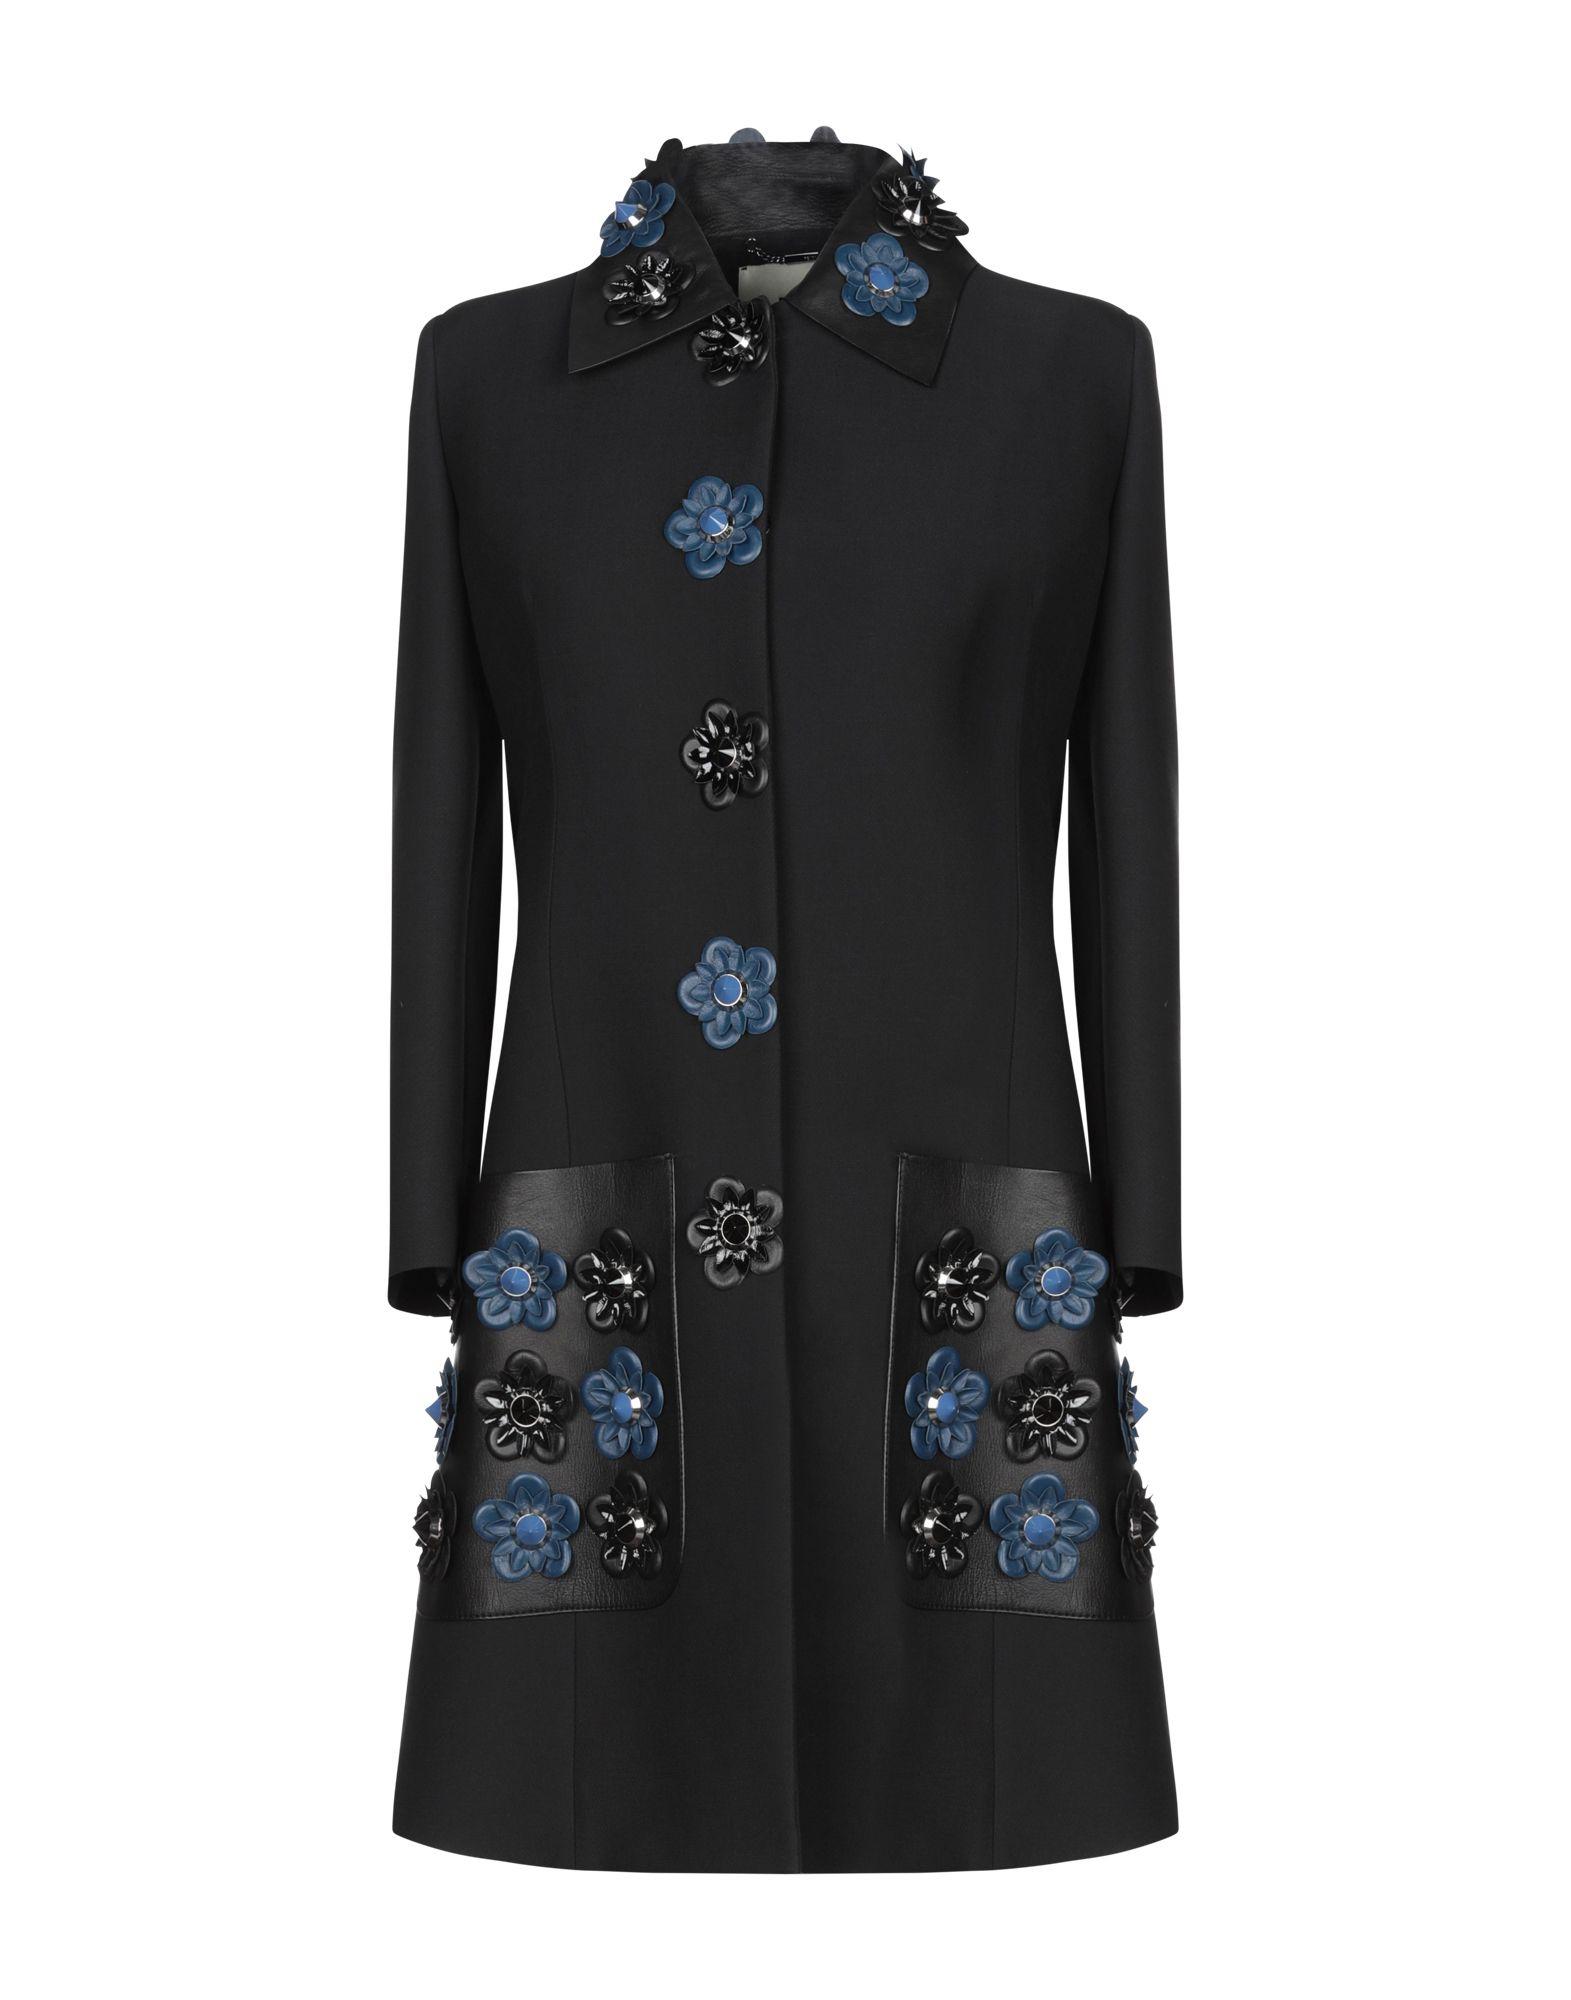 3cdeff15 Buy fendi coats for women - Best women's fendi coats shop - Cools.com